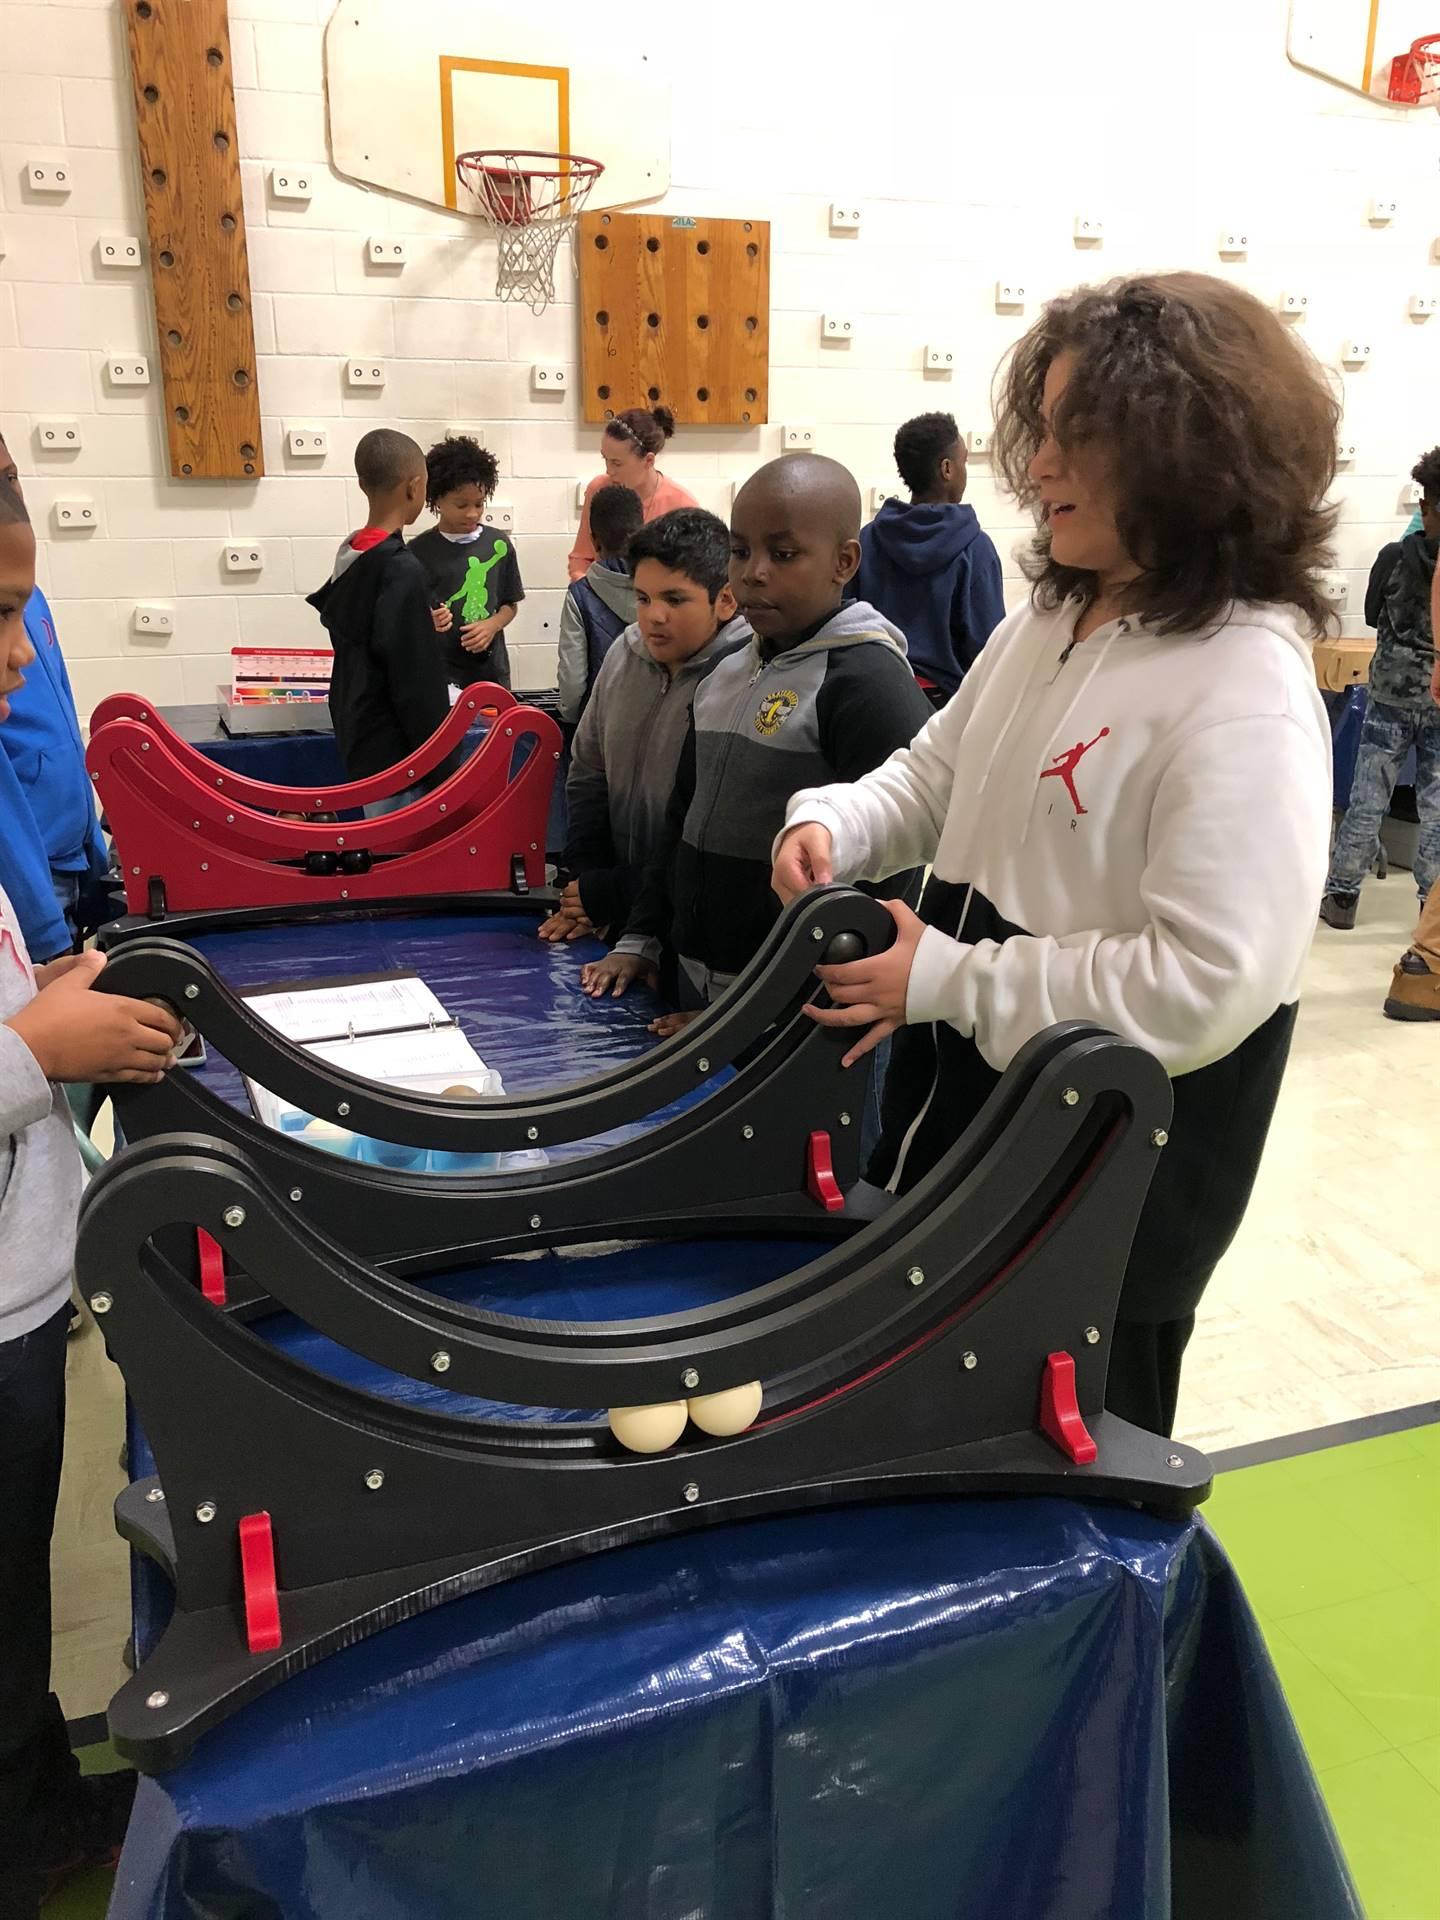 Students exploring different Science activities